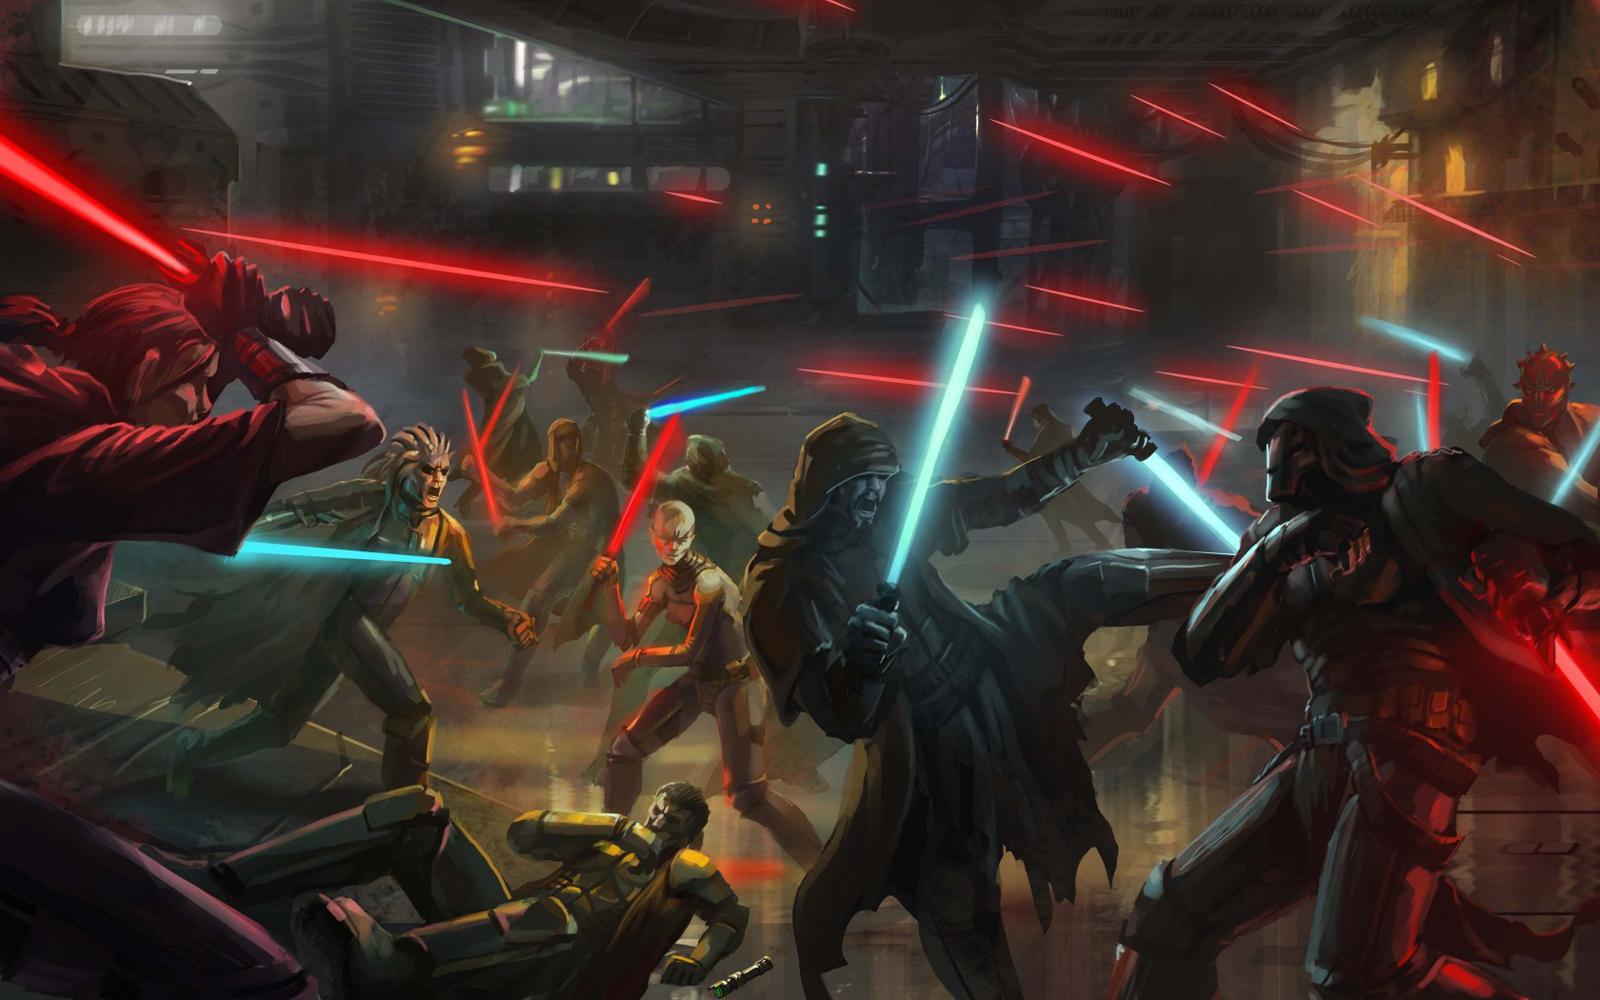 Star Wars Knights of the Old Republic Hd Desktop Wallpaper